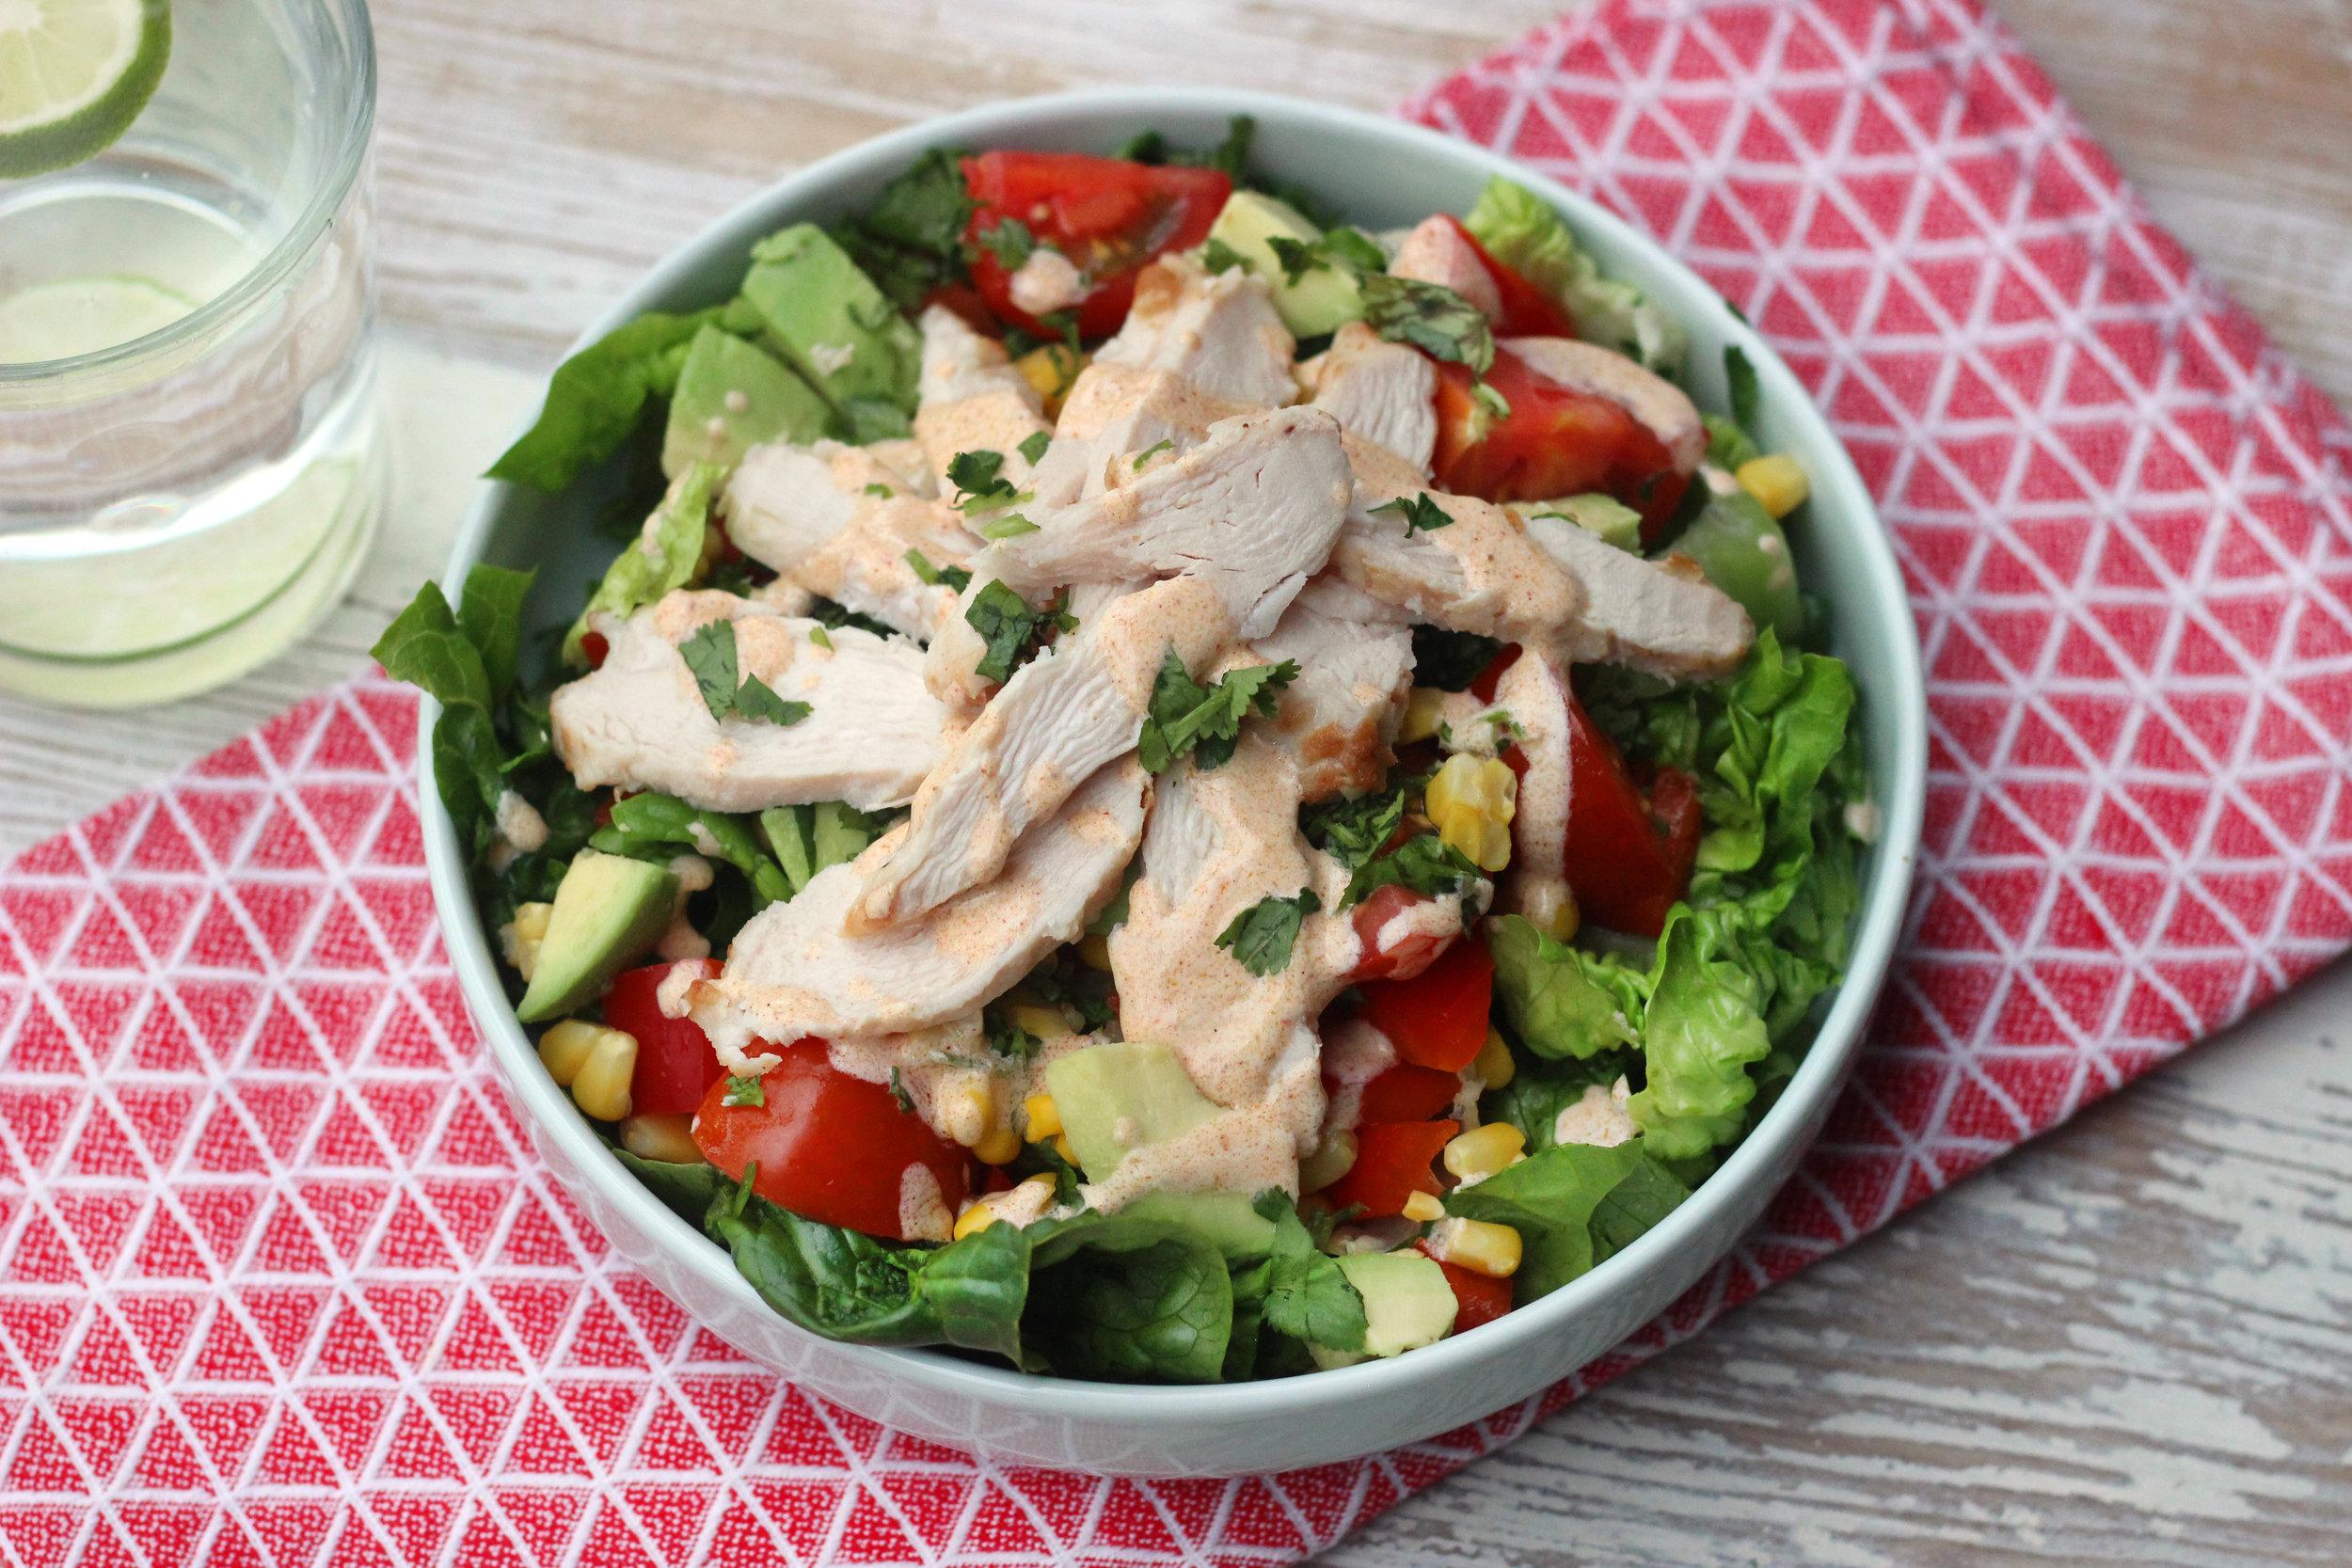 Shredded Southwest chicken salad.JPG